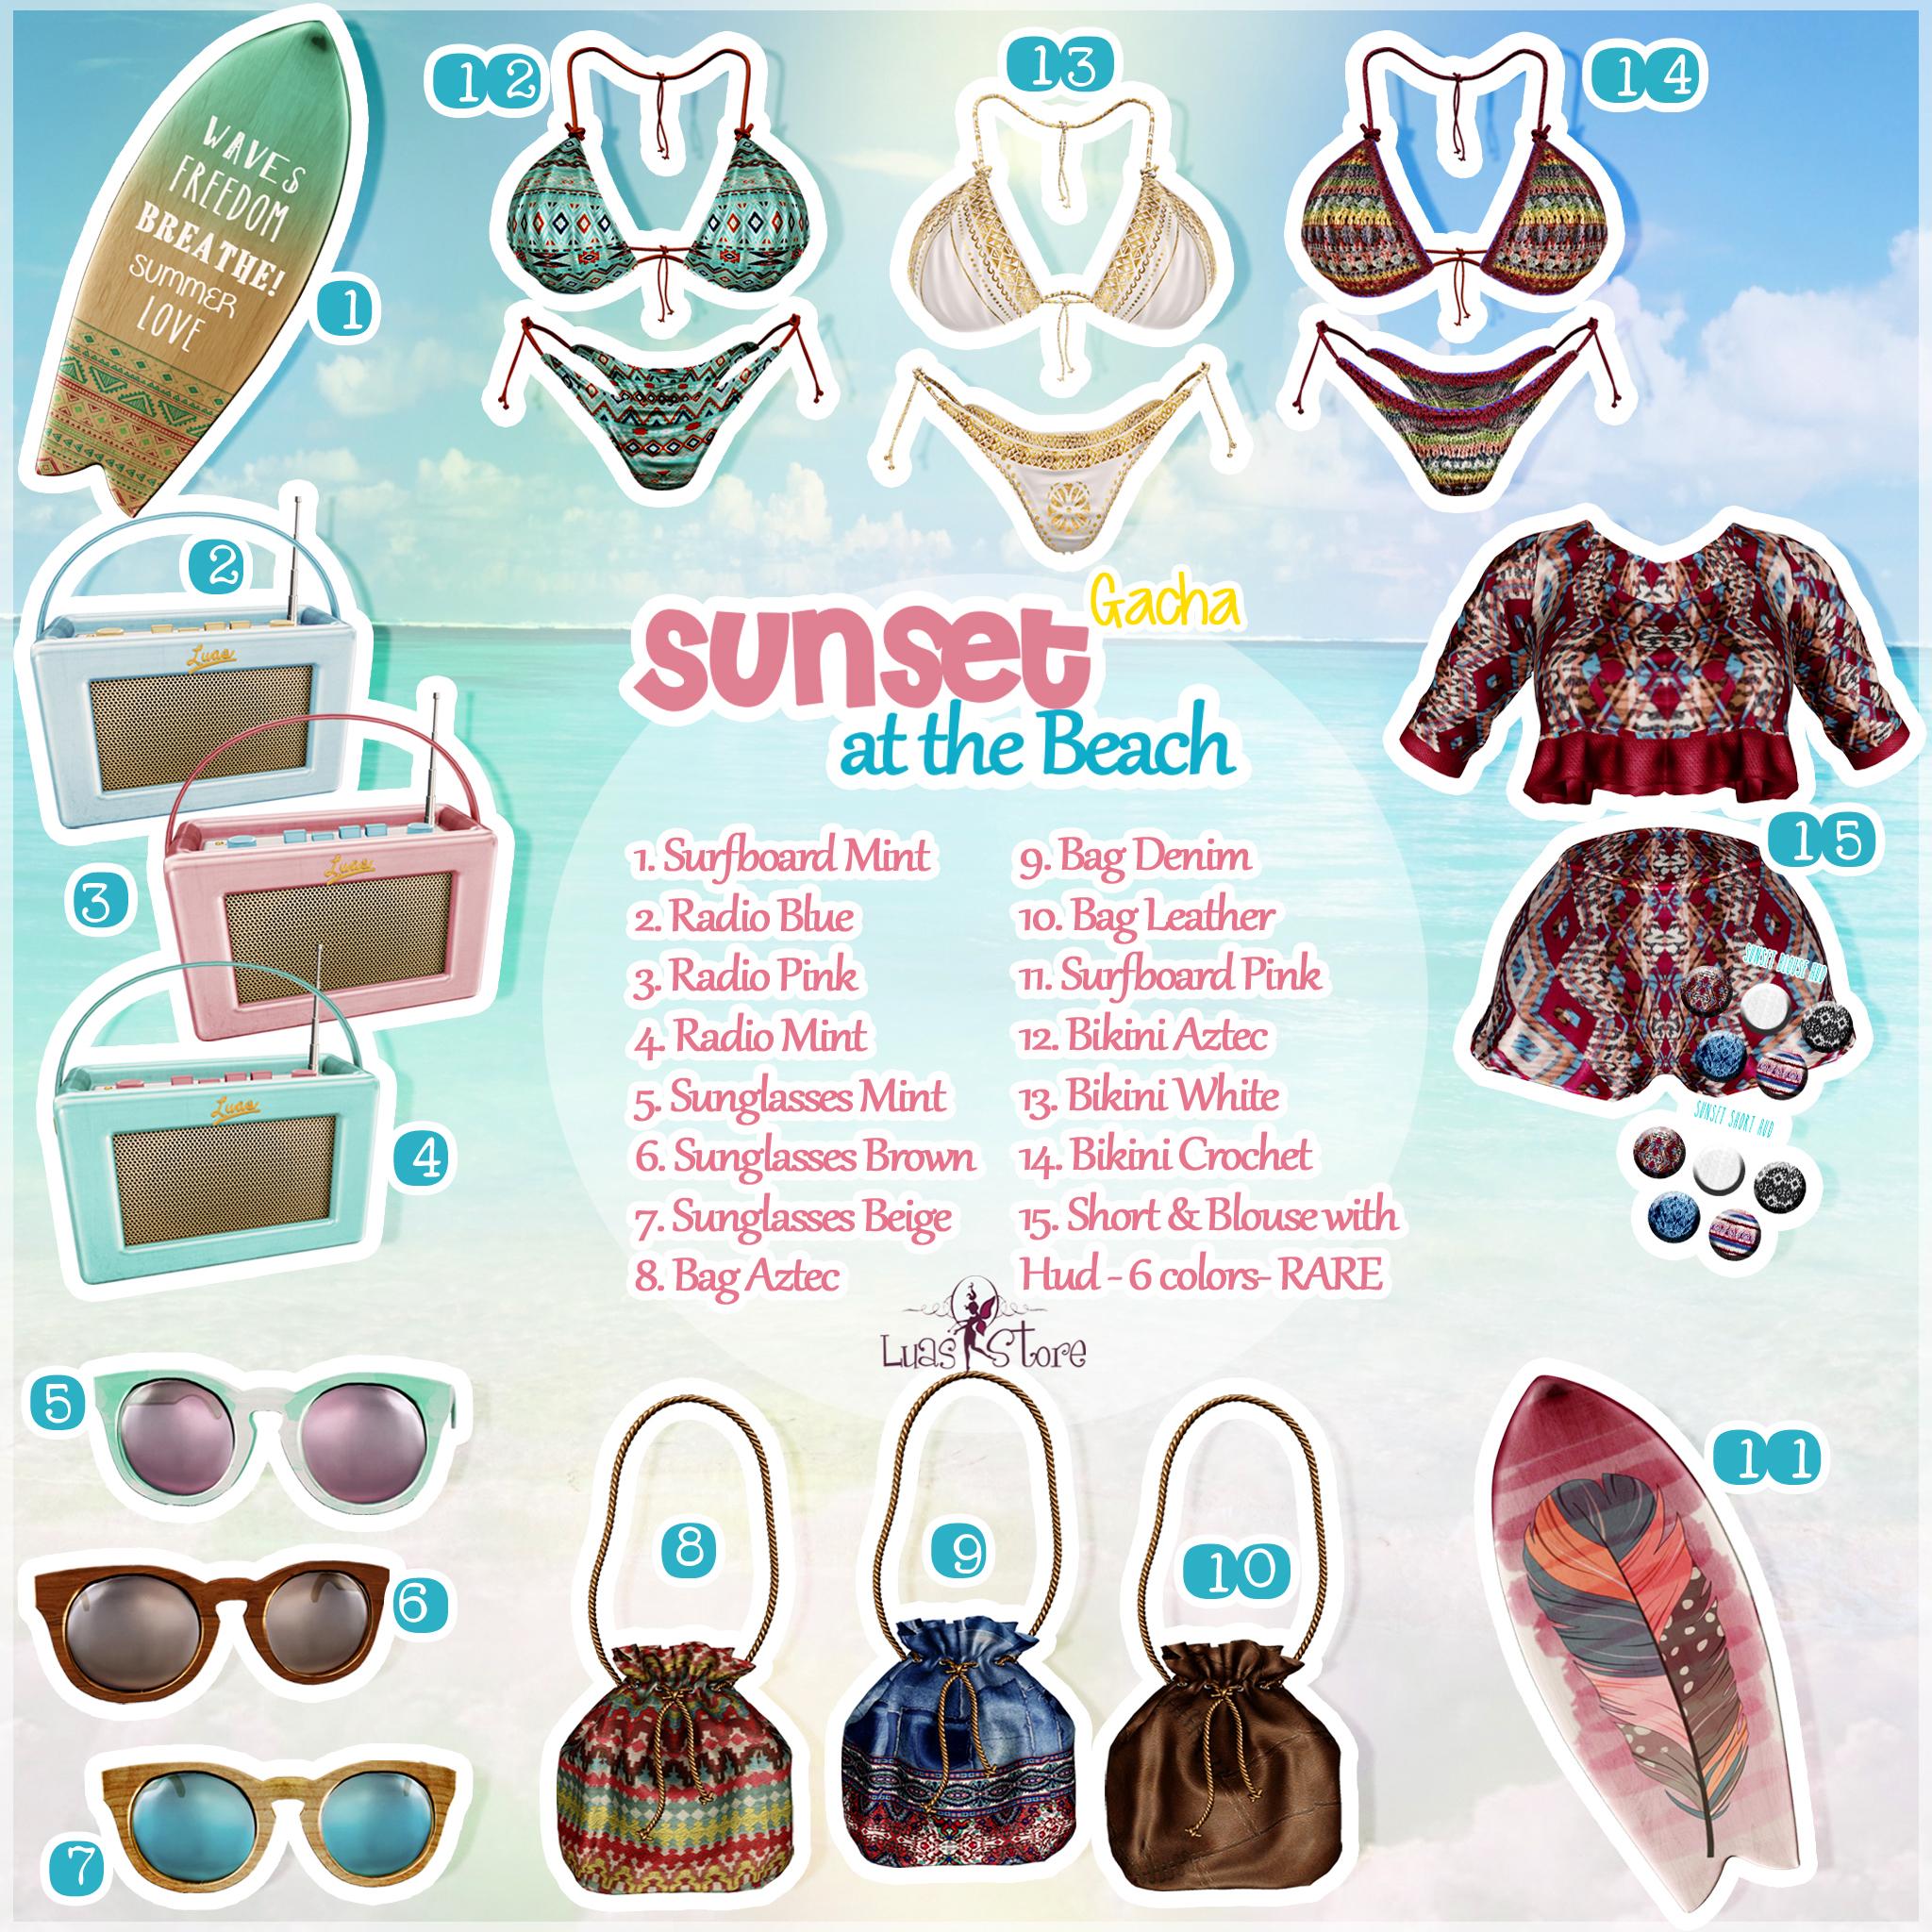 Luas-Sunset-at-the-Beach-Gacha-Key2.jpg